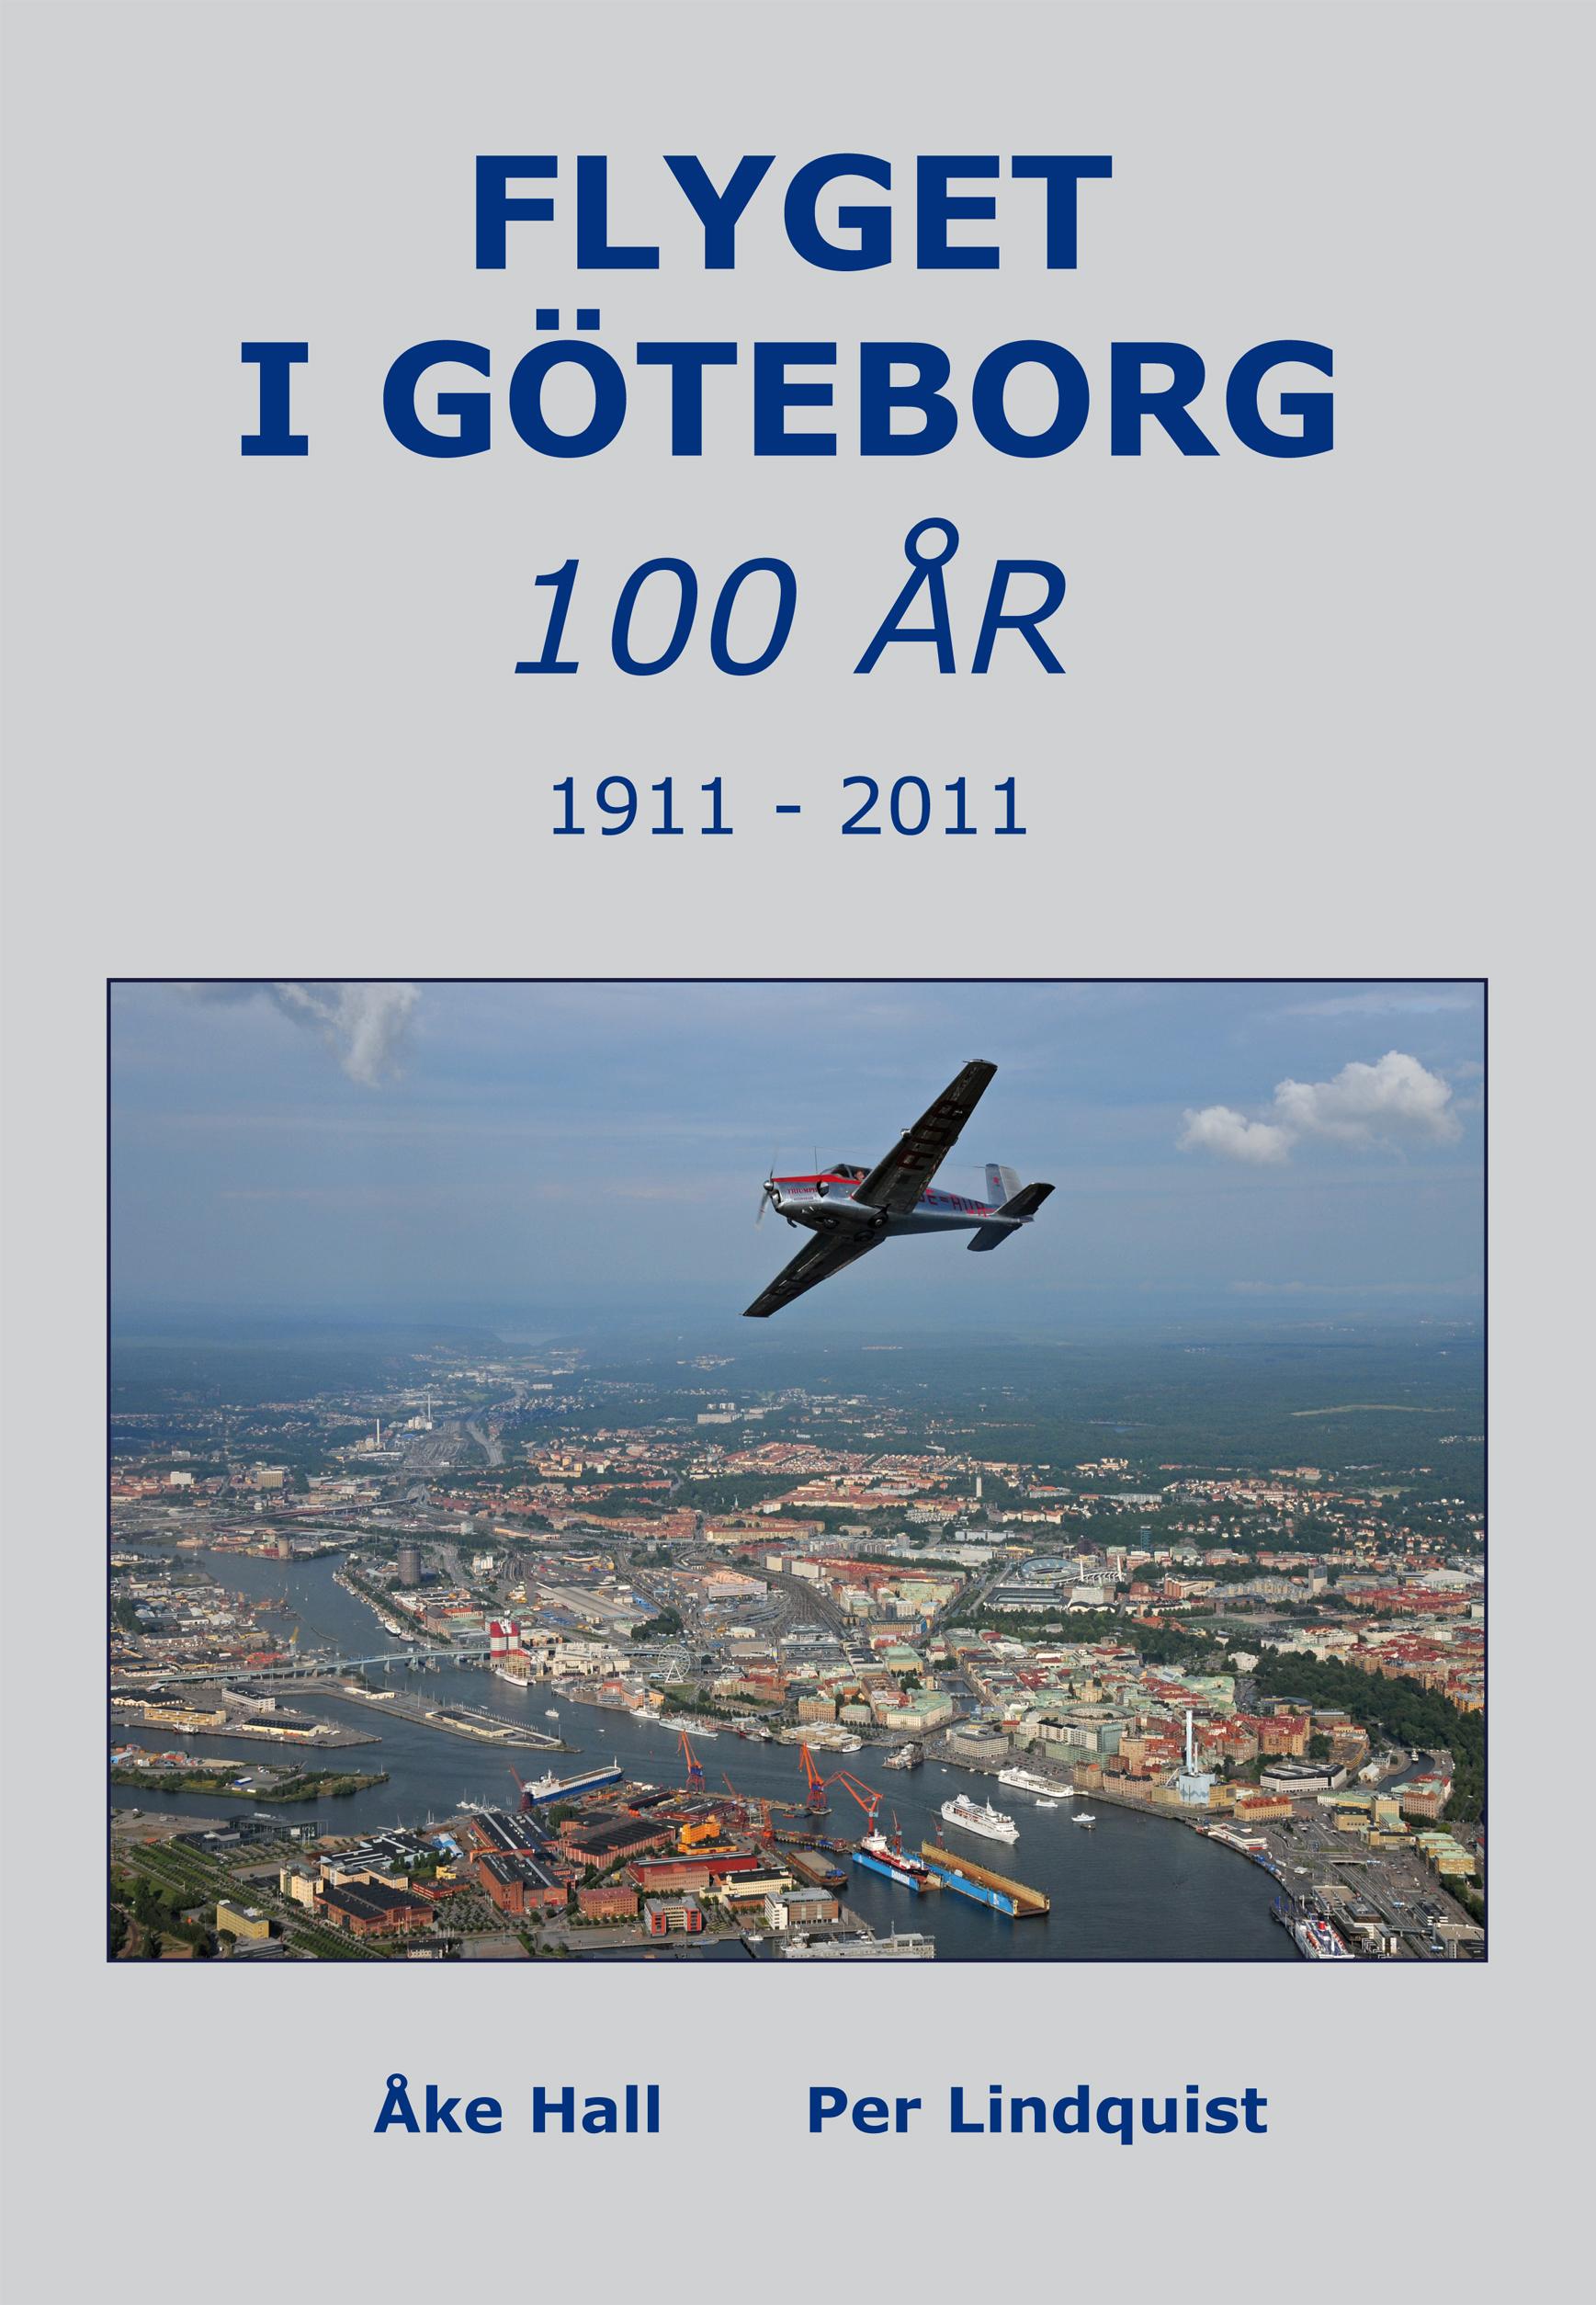 Flyget i Göteborg 100 år-0